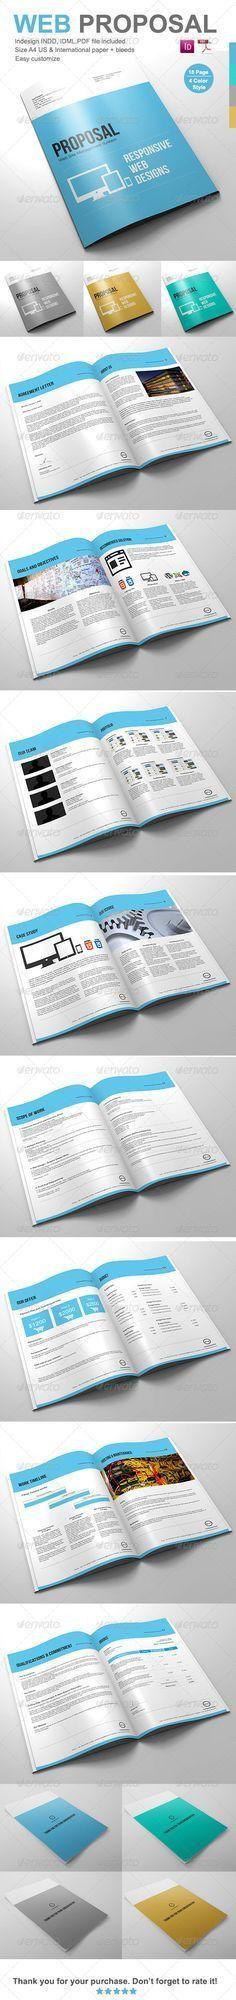 Clean Digital Marketing Proposal | Marketing proposal, Proposal ...